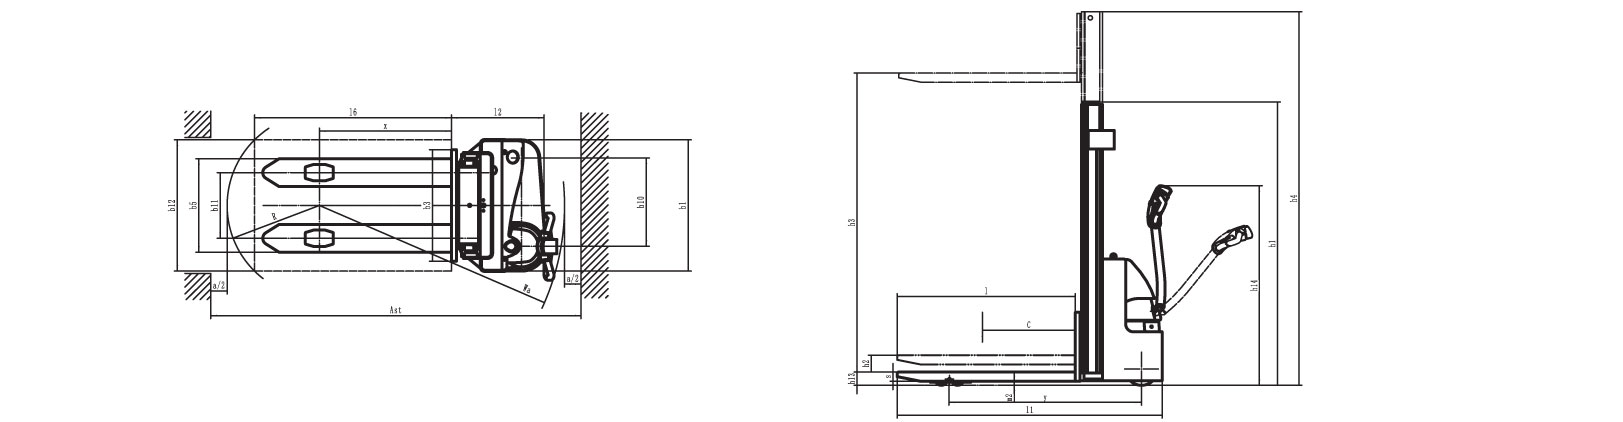 draw.jpg (92 KB)